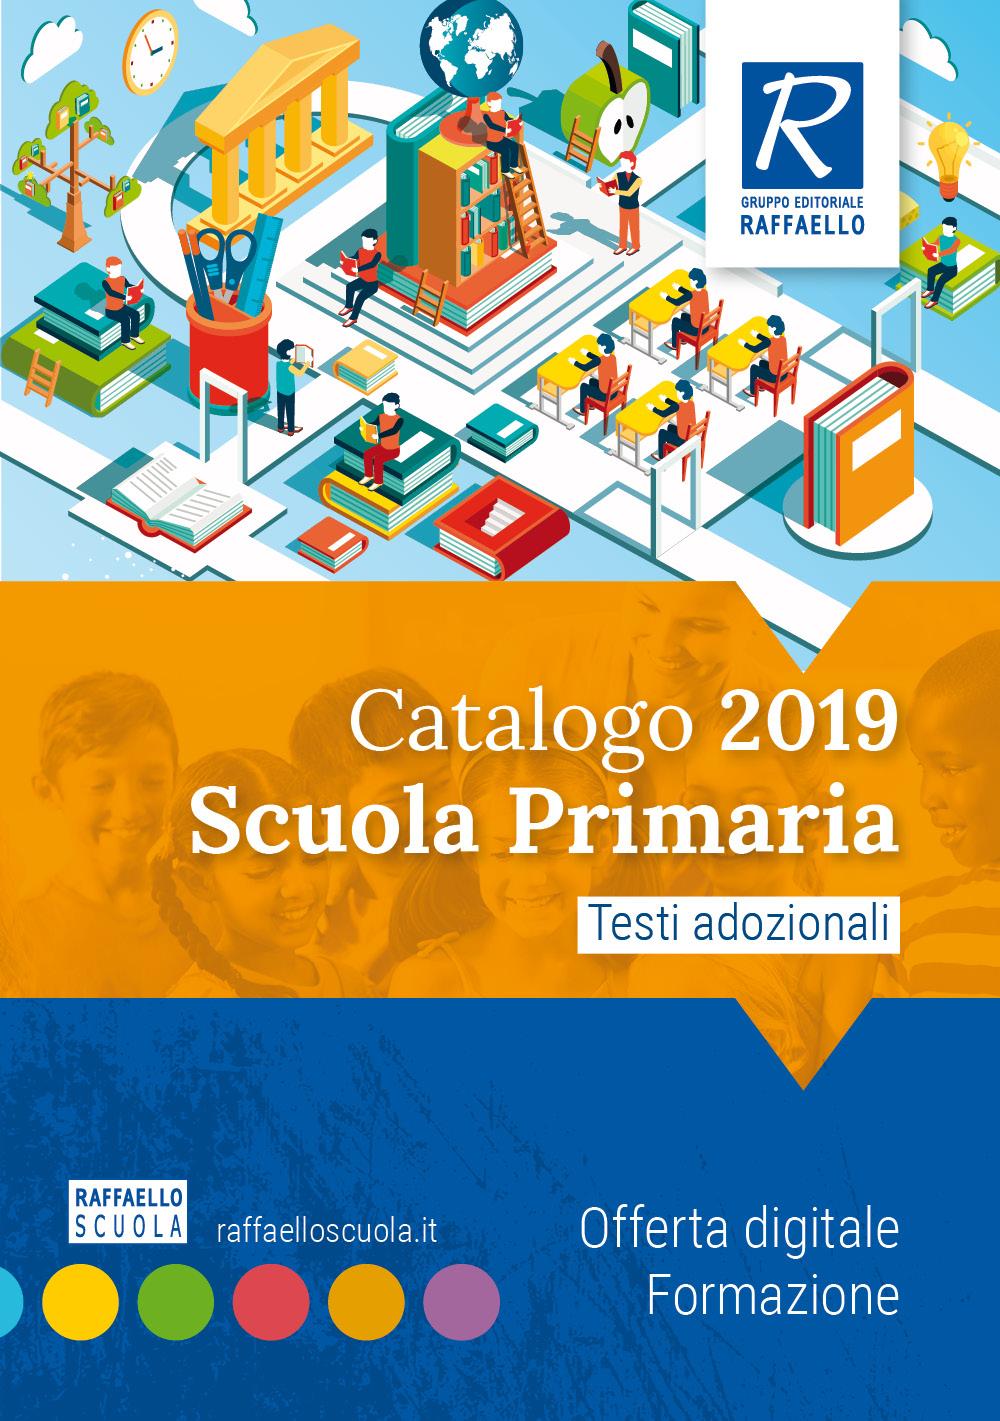 Scuola Primaria Ministeriale 2019